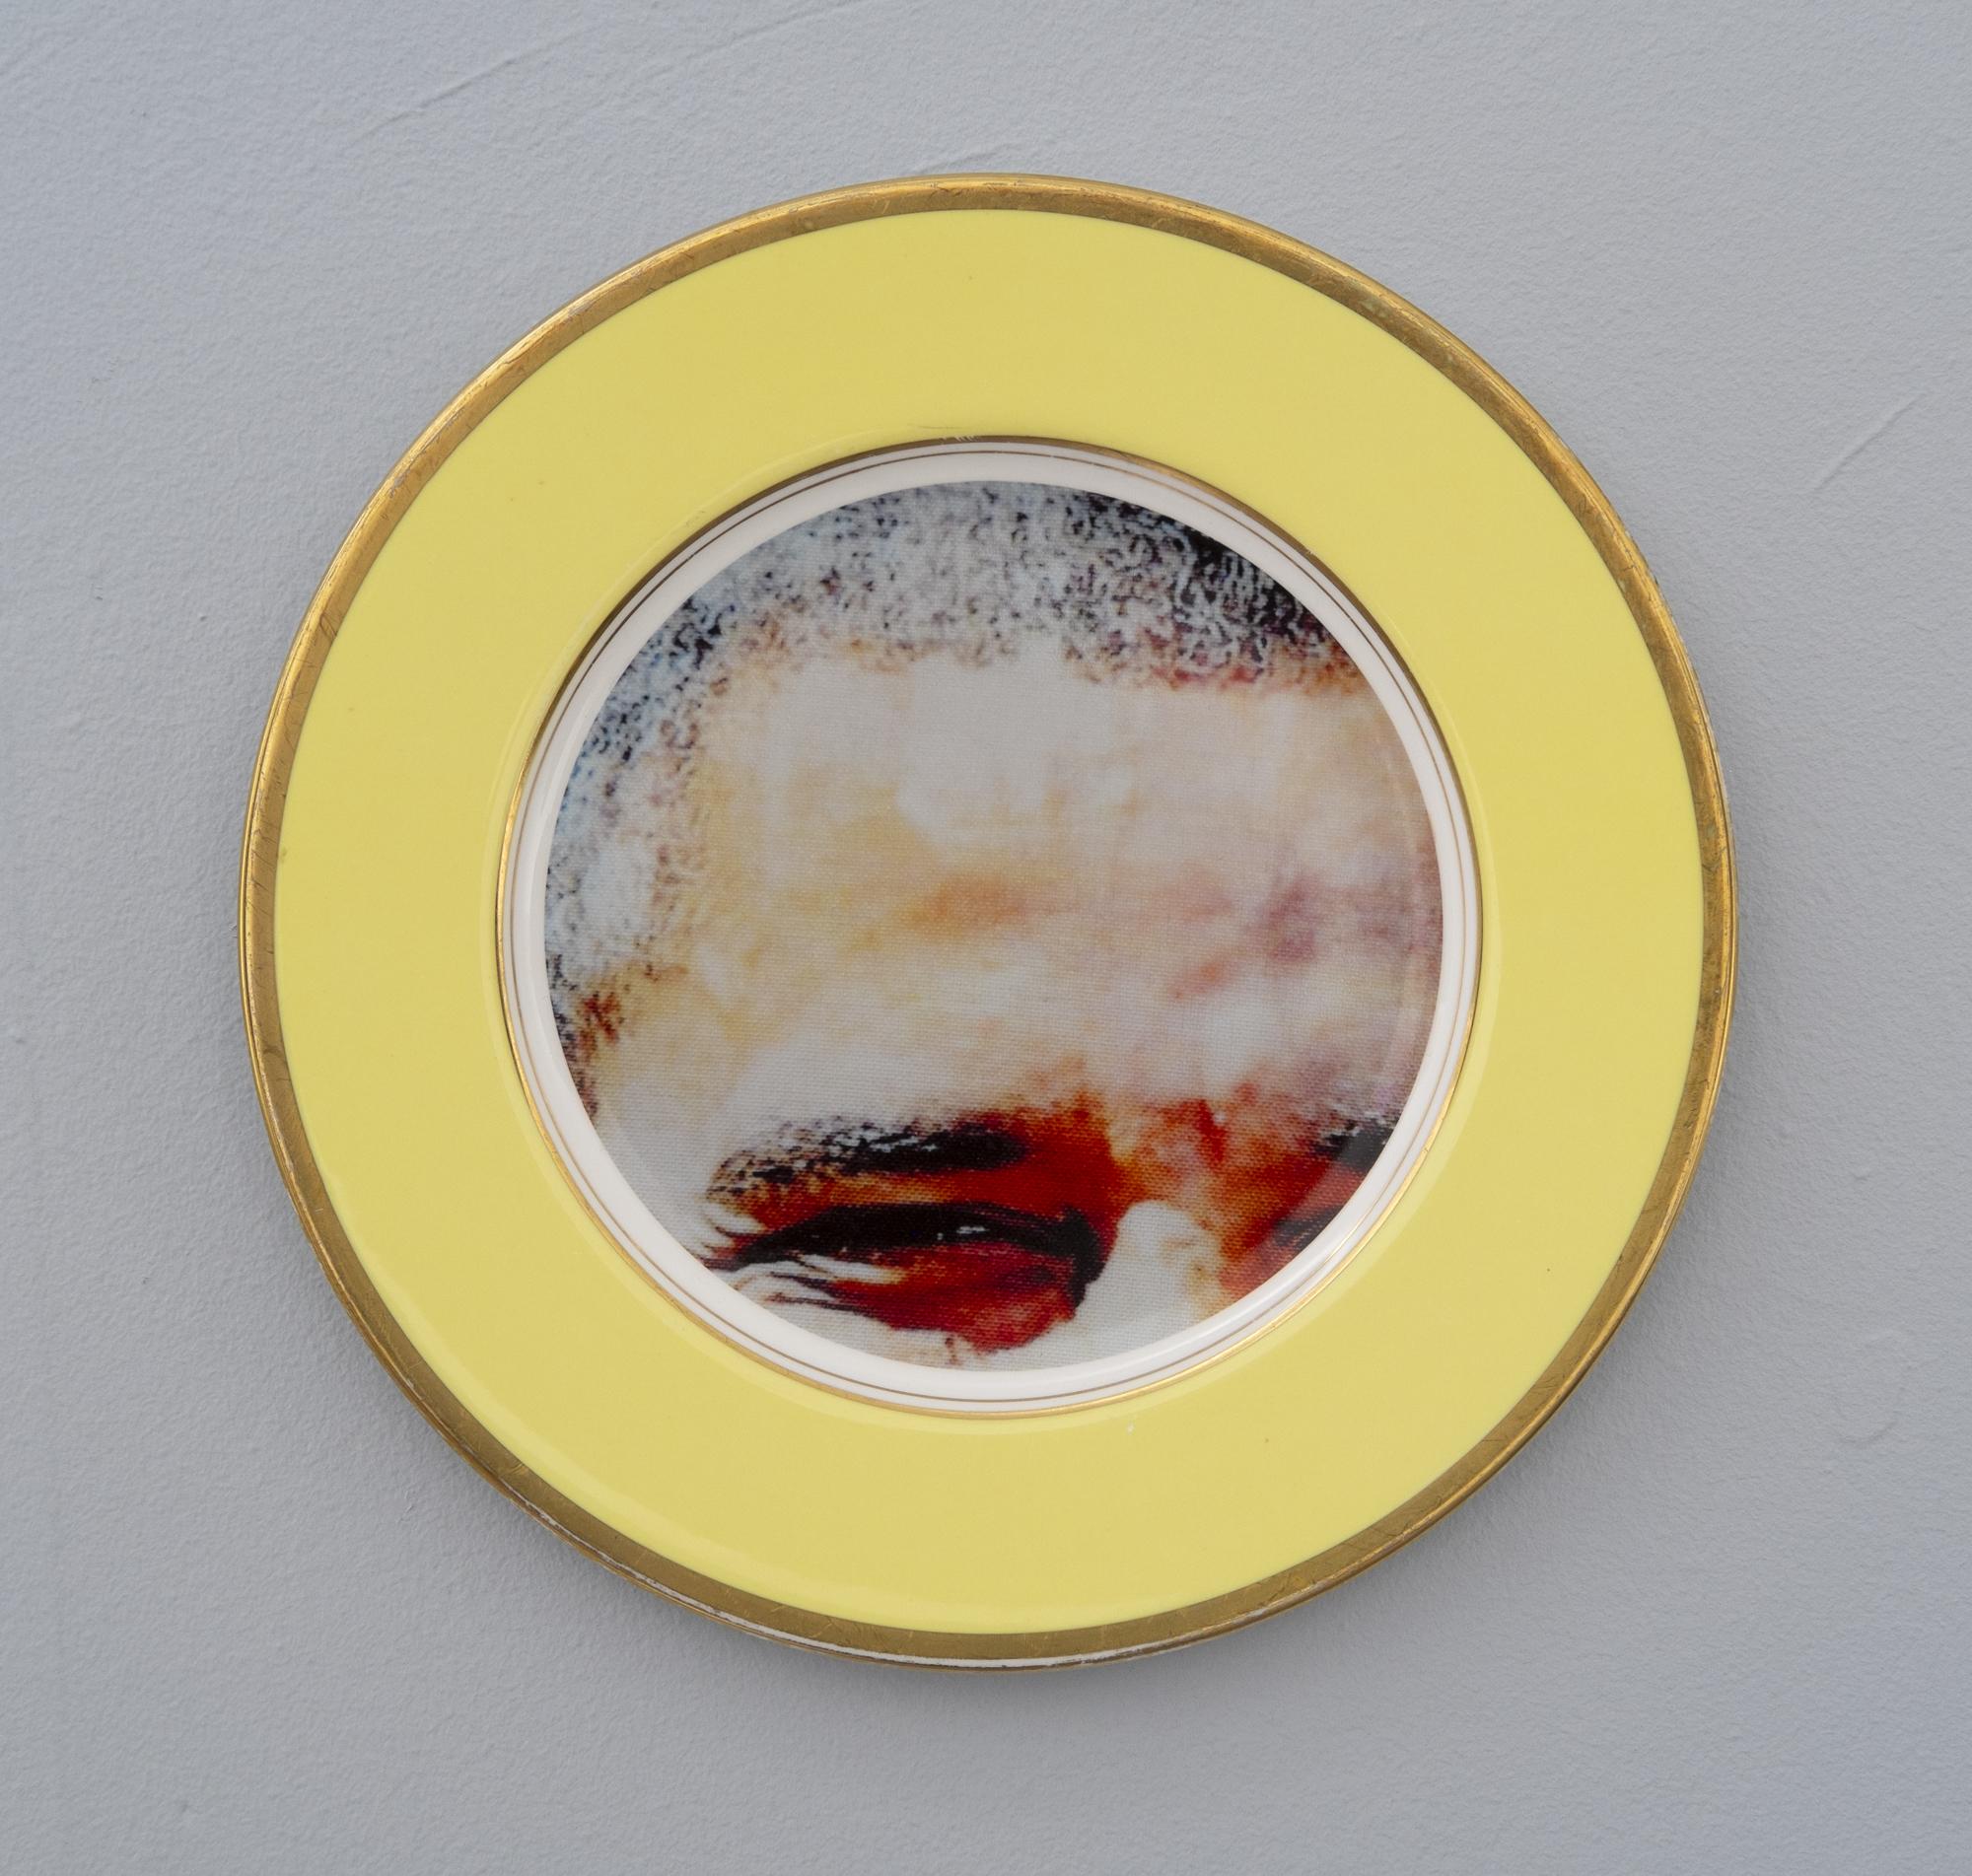 Bean Gilsdorf,  Barack Obama,  2018, Ceramic plate, 10.5 inch diameter